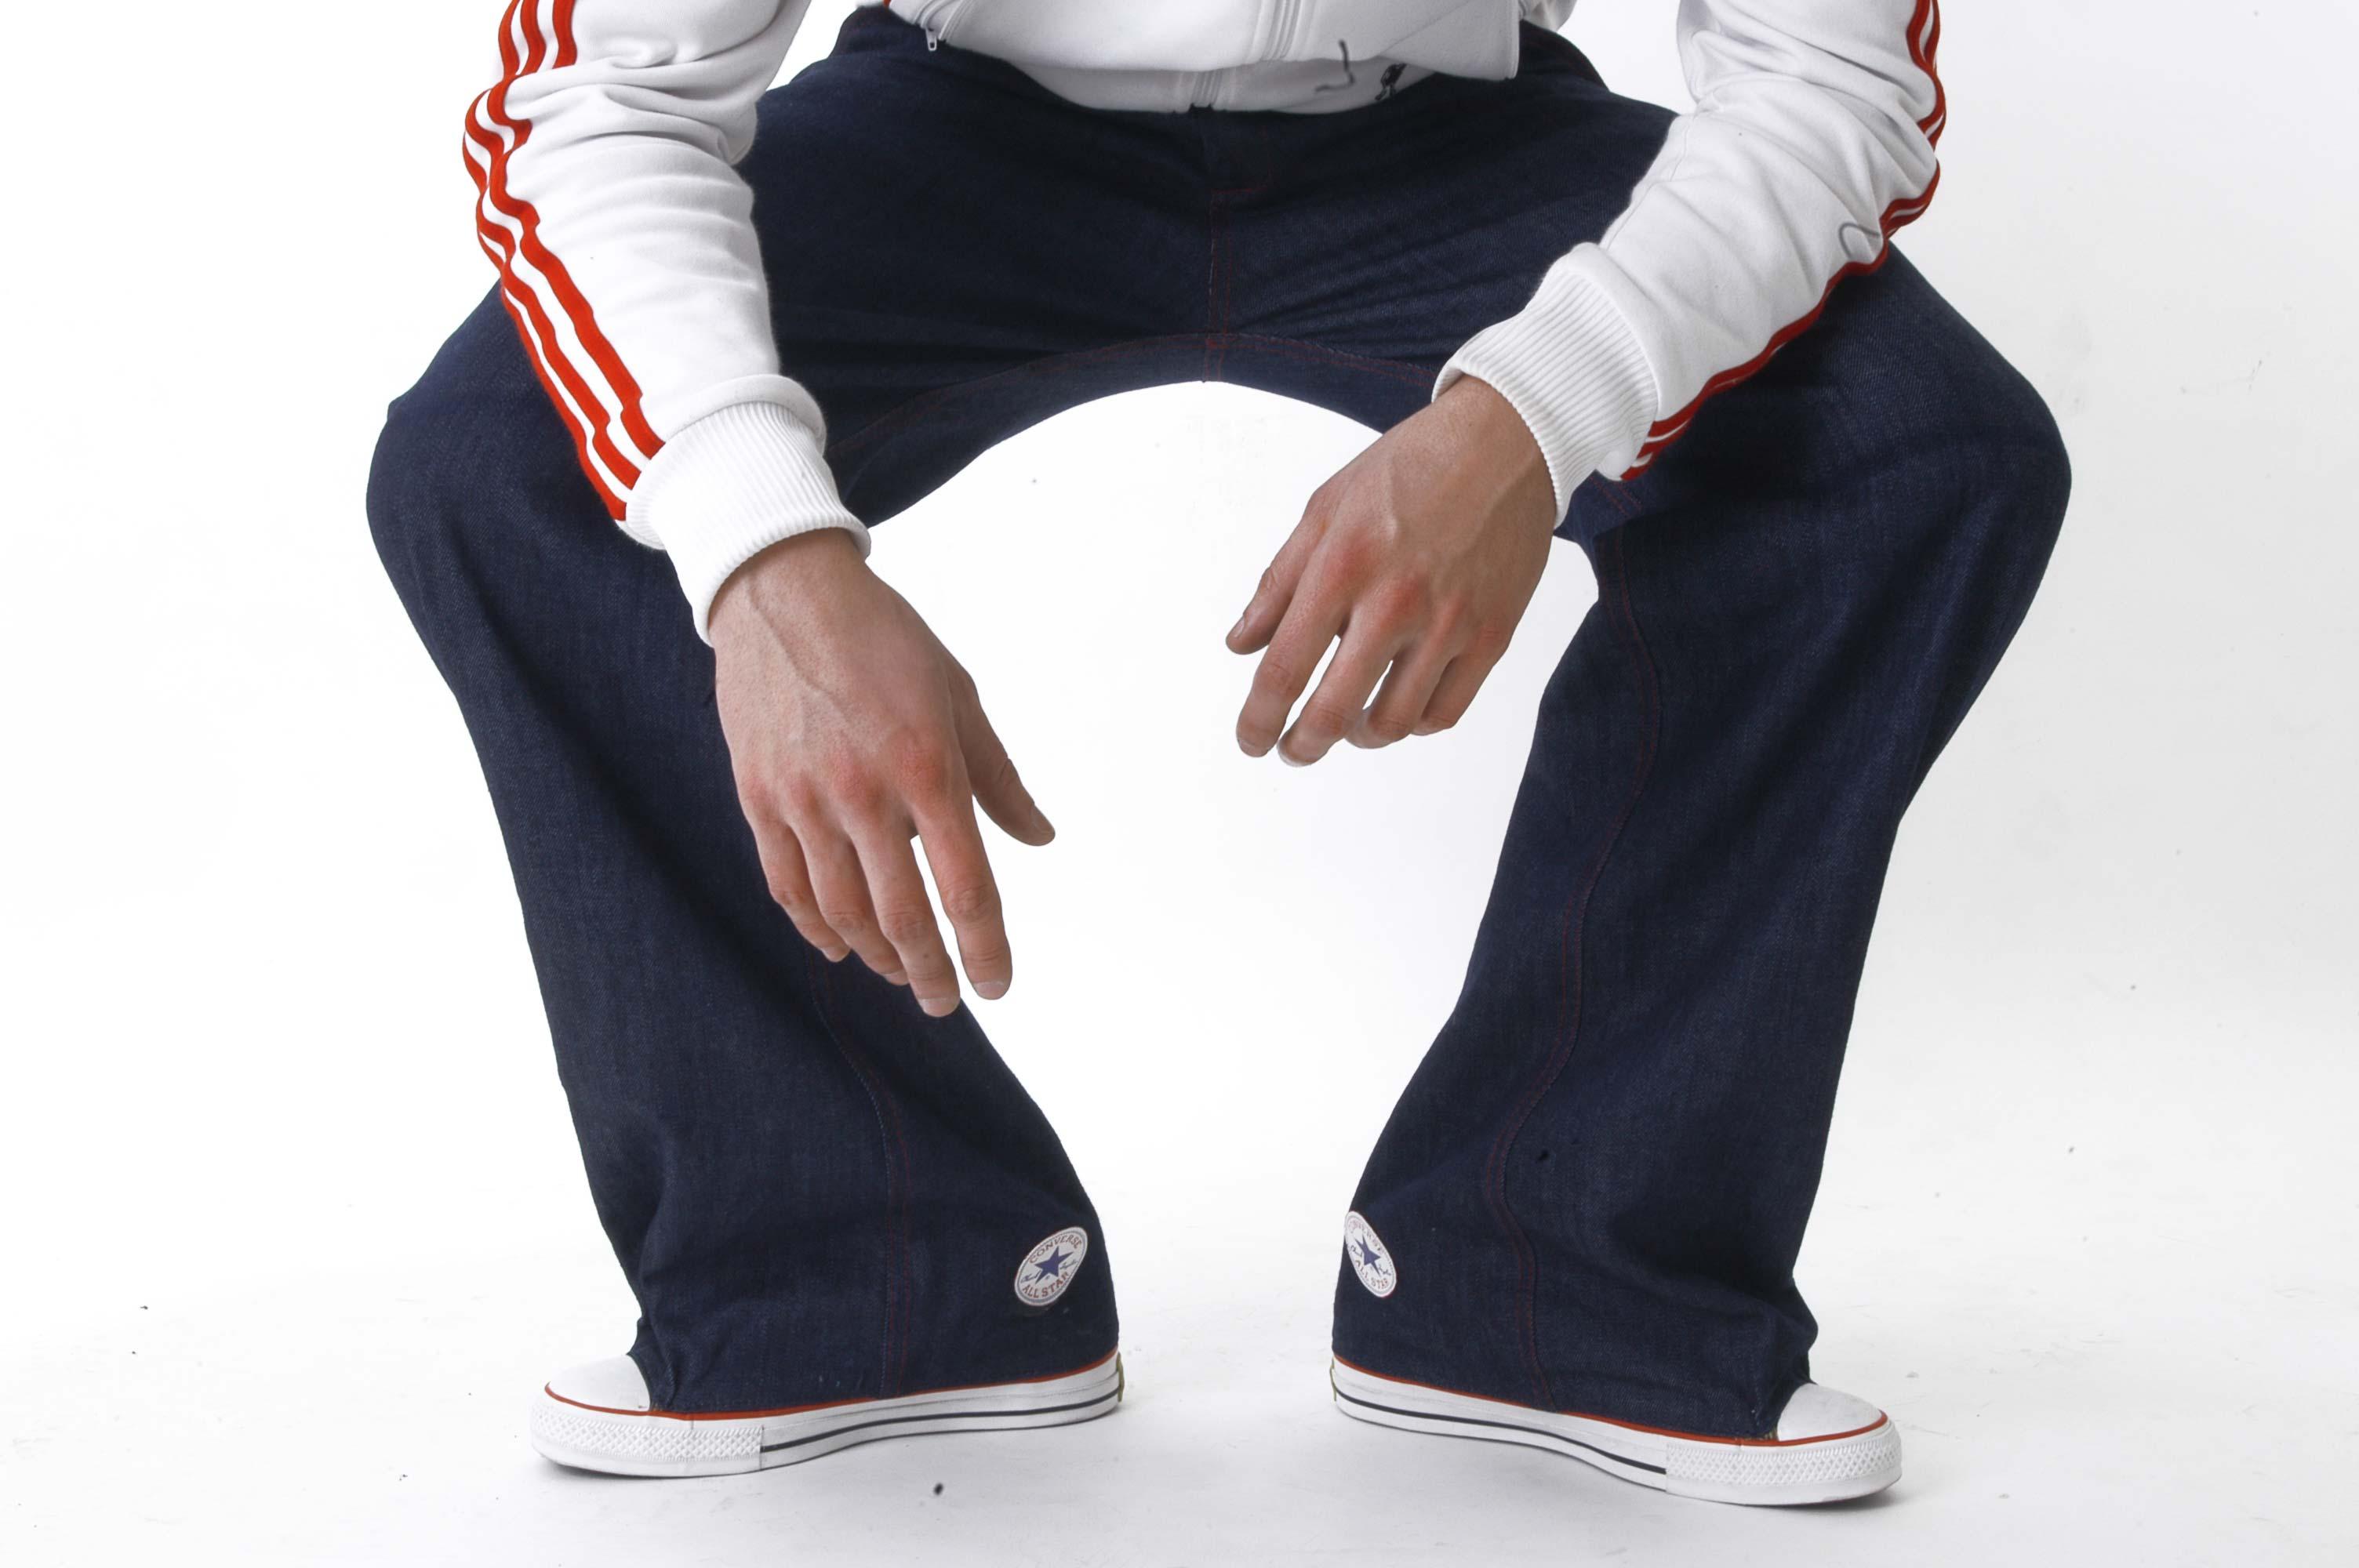 Shoe Pants Make It All So Much Easier | Bit Rebels